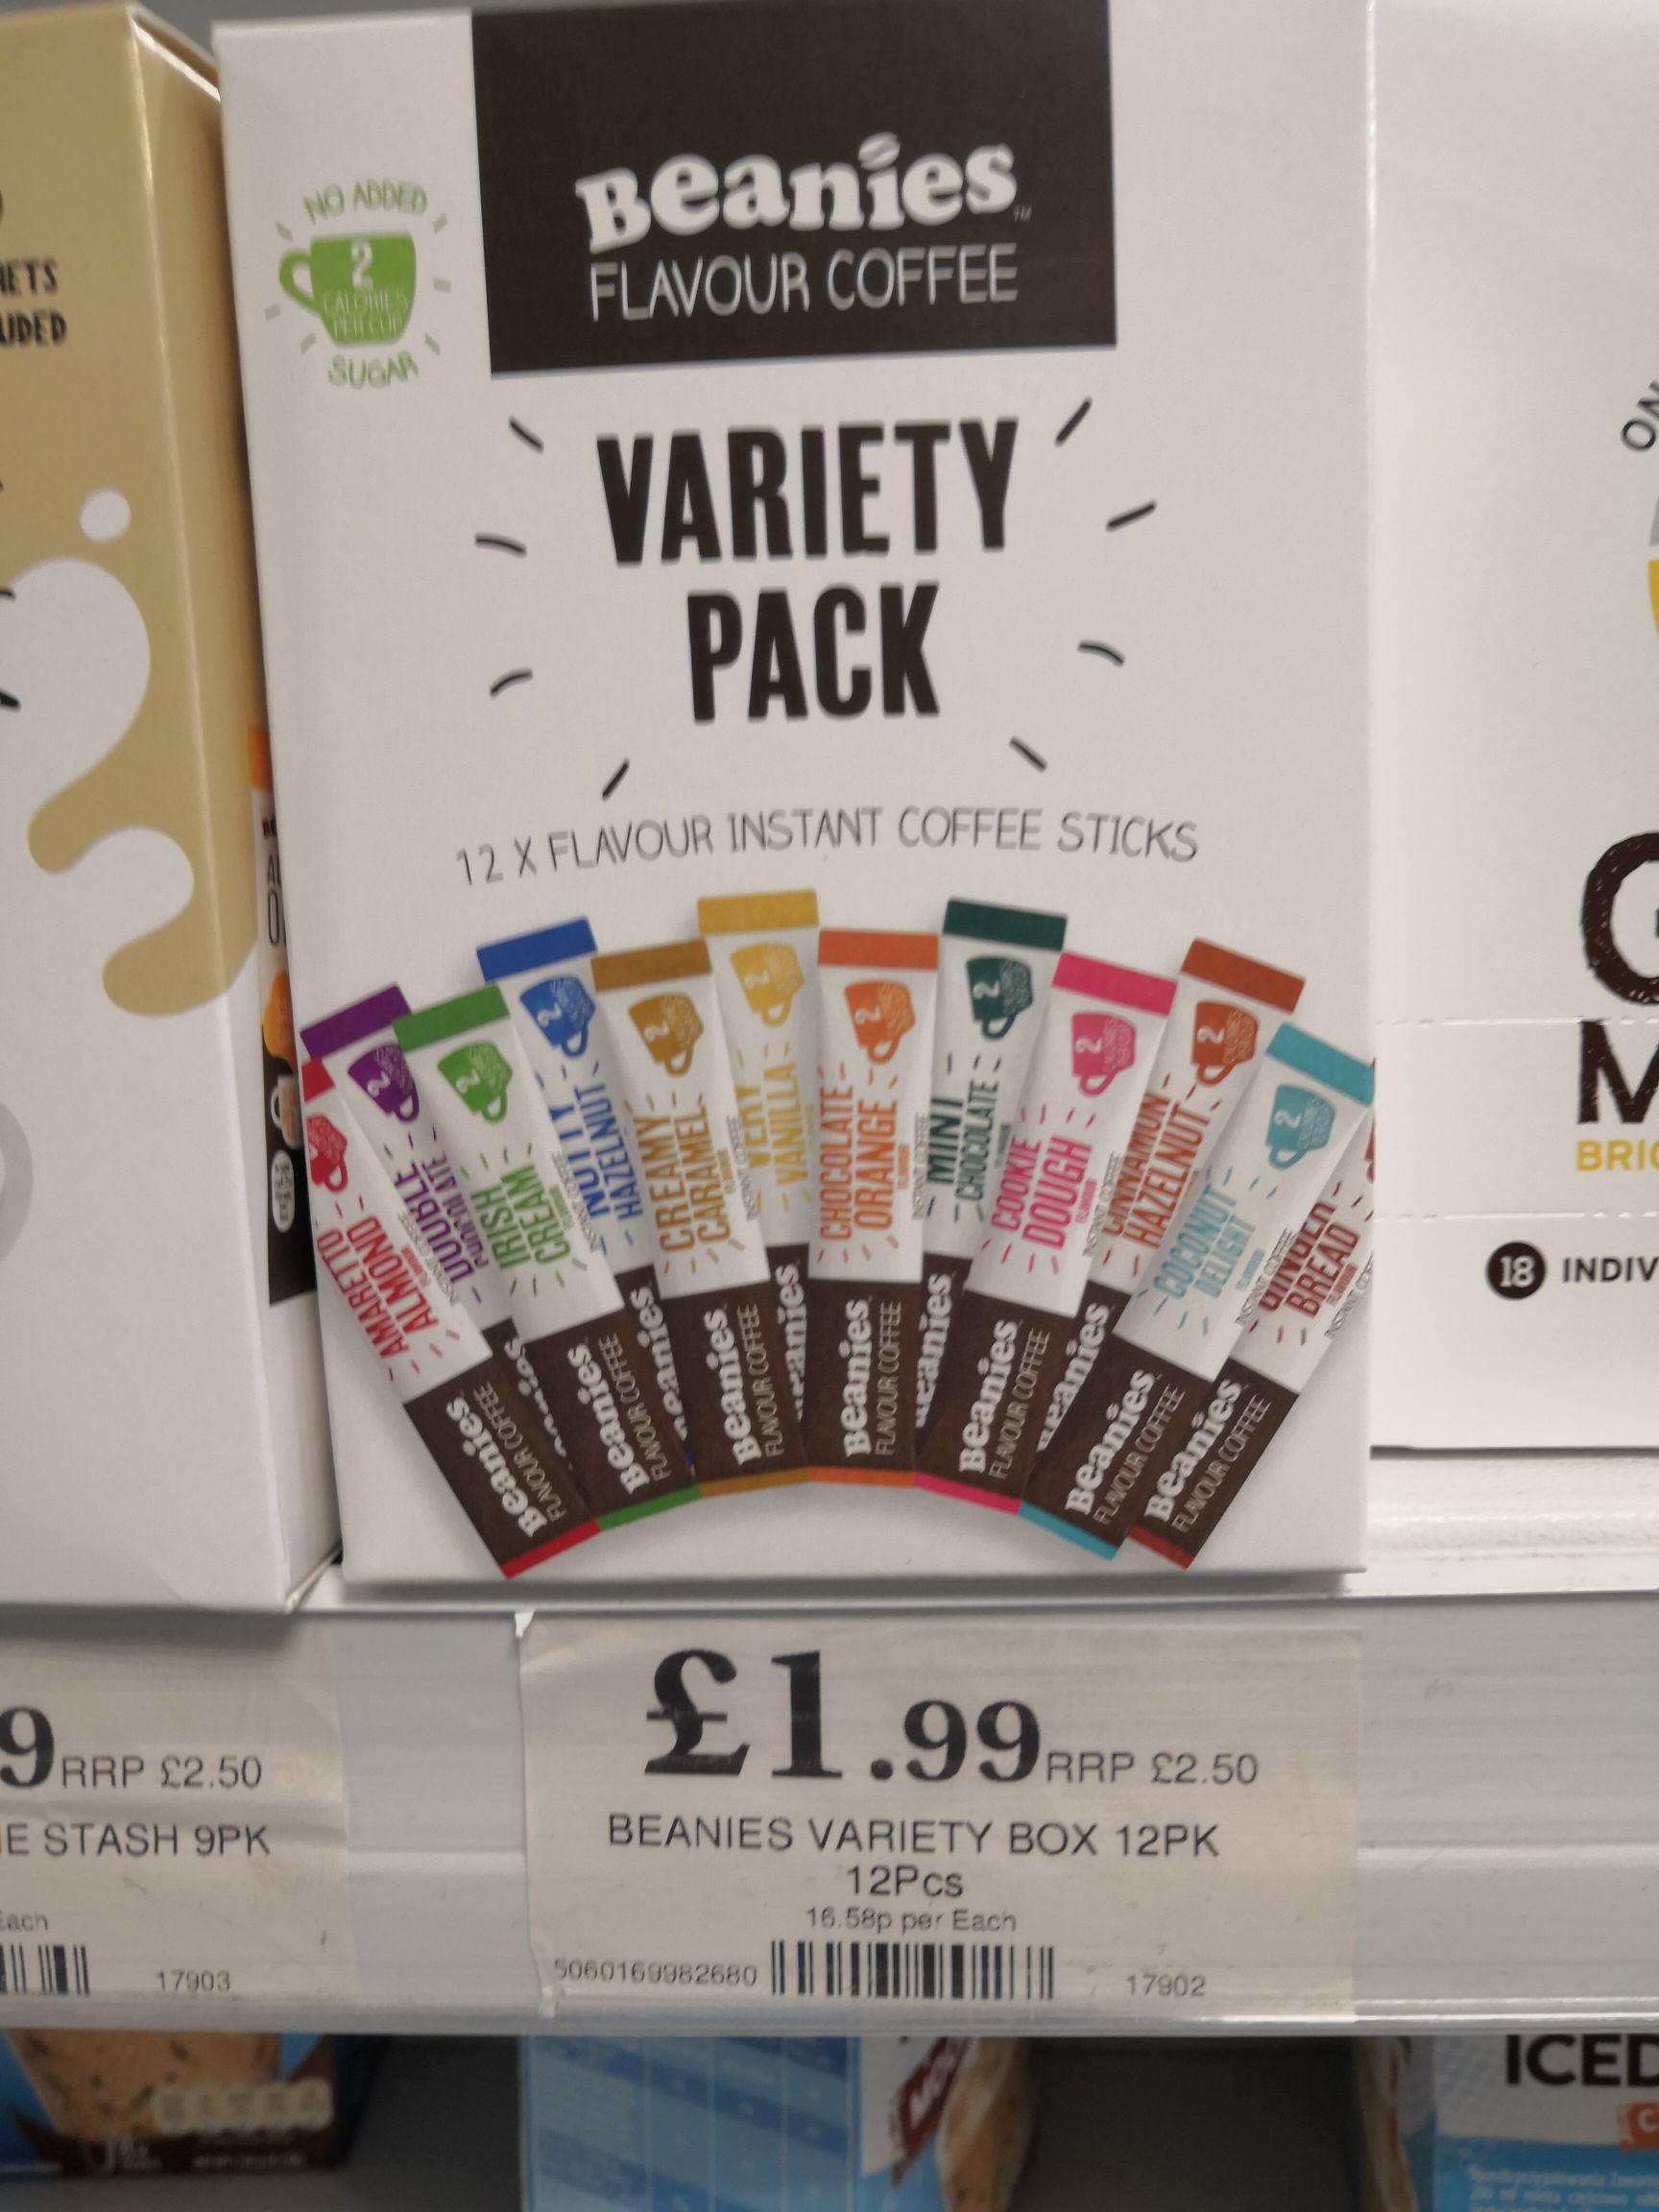 Beanies flavour coffee variety (12pk) £1.99 @ Home Bargains Prenton / Wirral